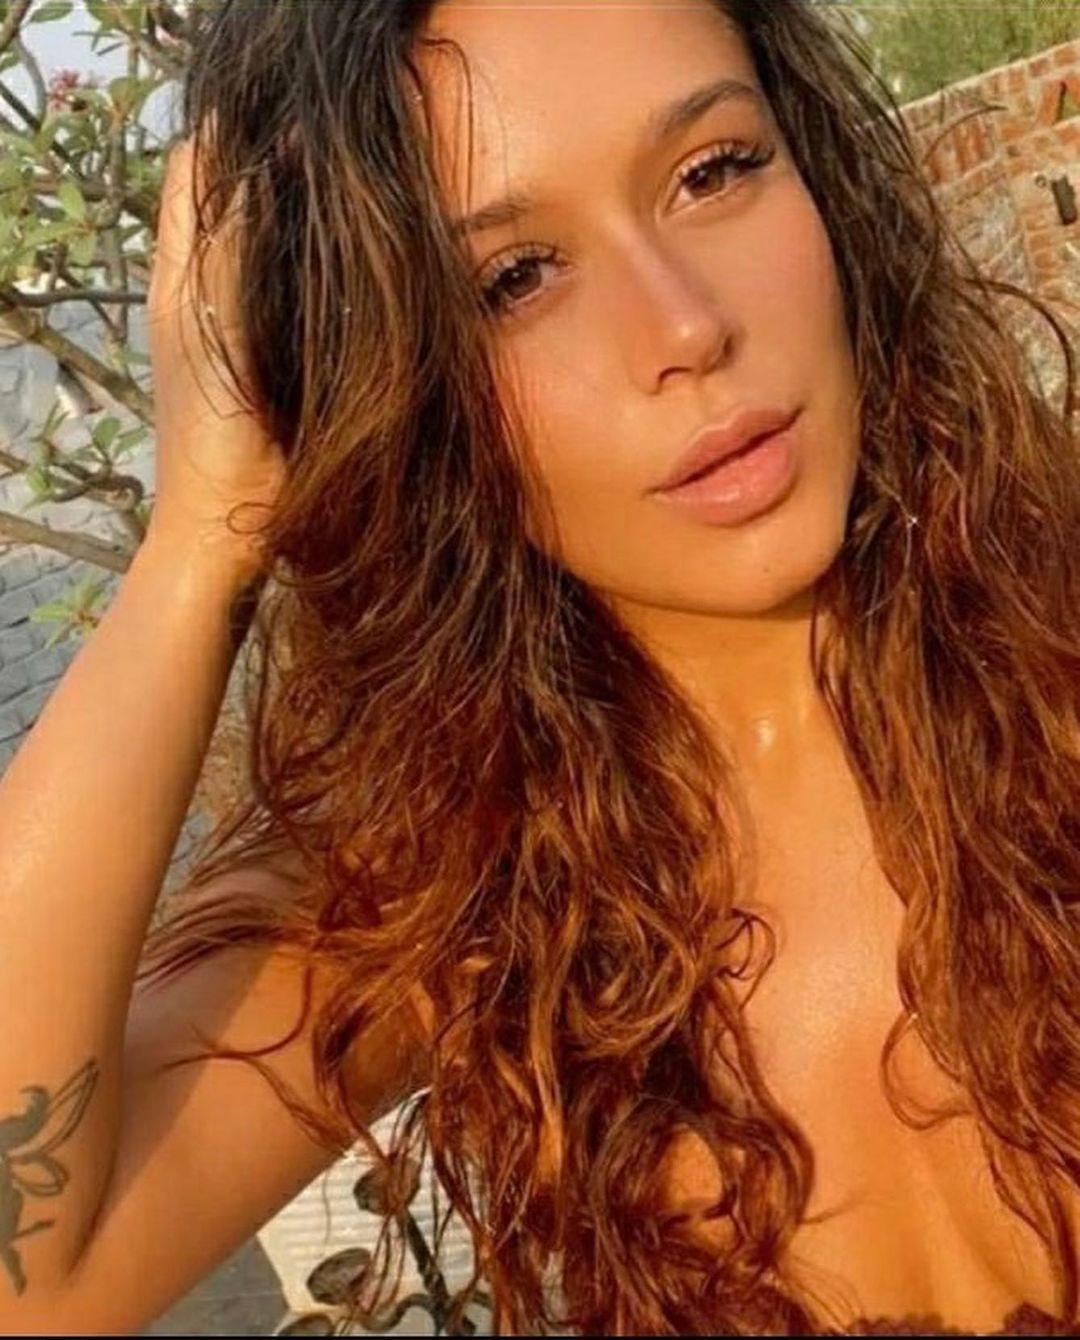 30+ Actress krishna shroff Latest Hot Bikini Photos